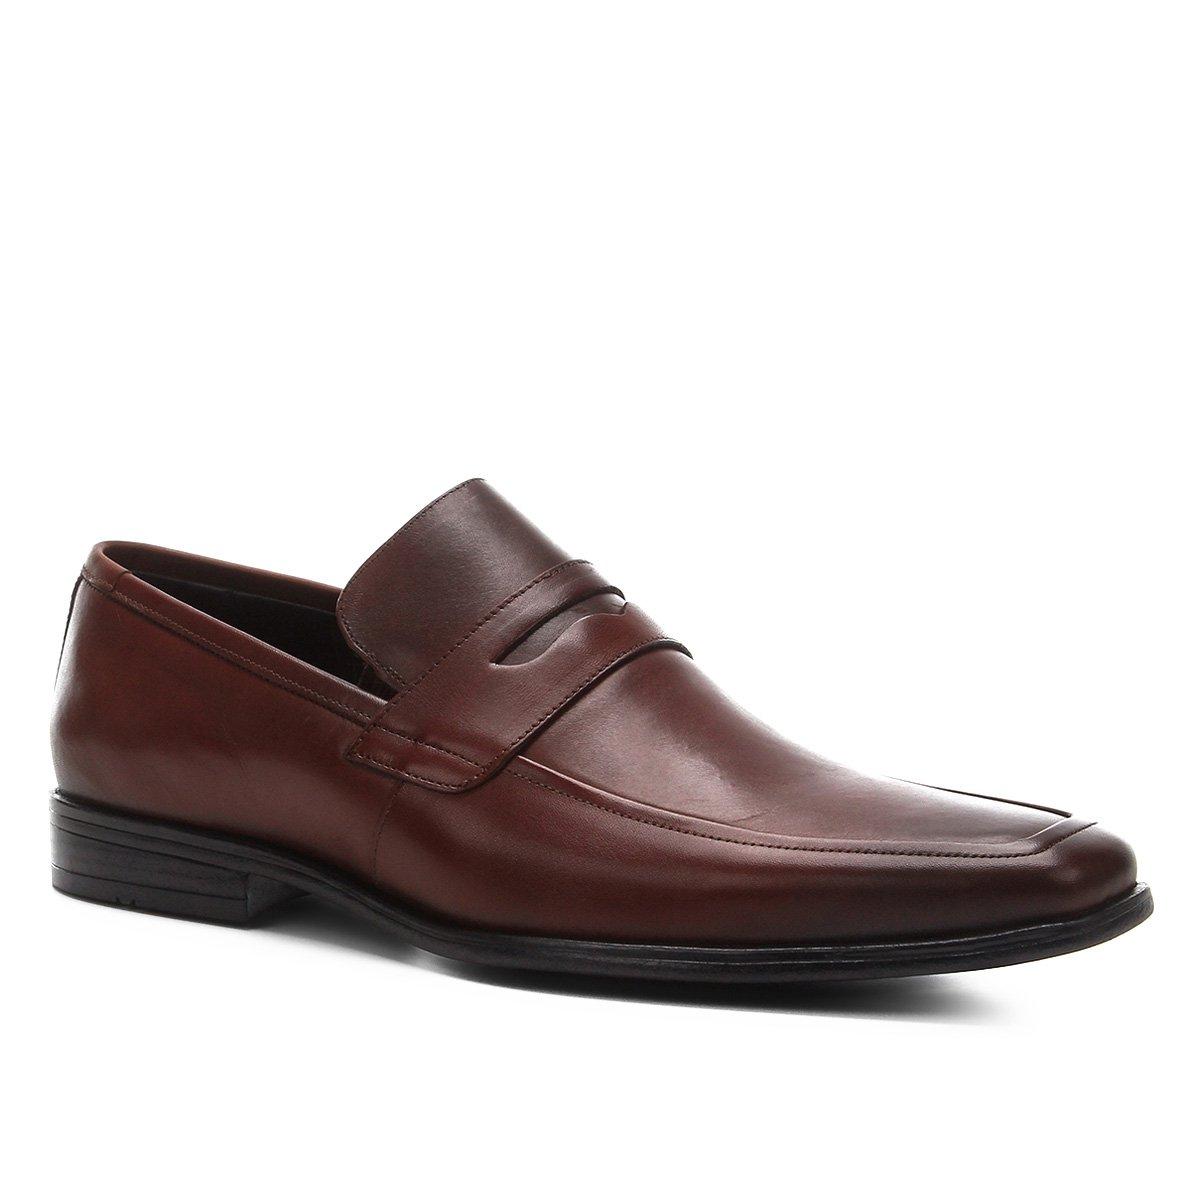 Sapato Social Couro Shoestock Bico Quadrado Masculino